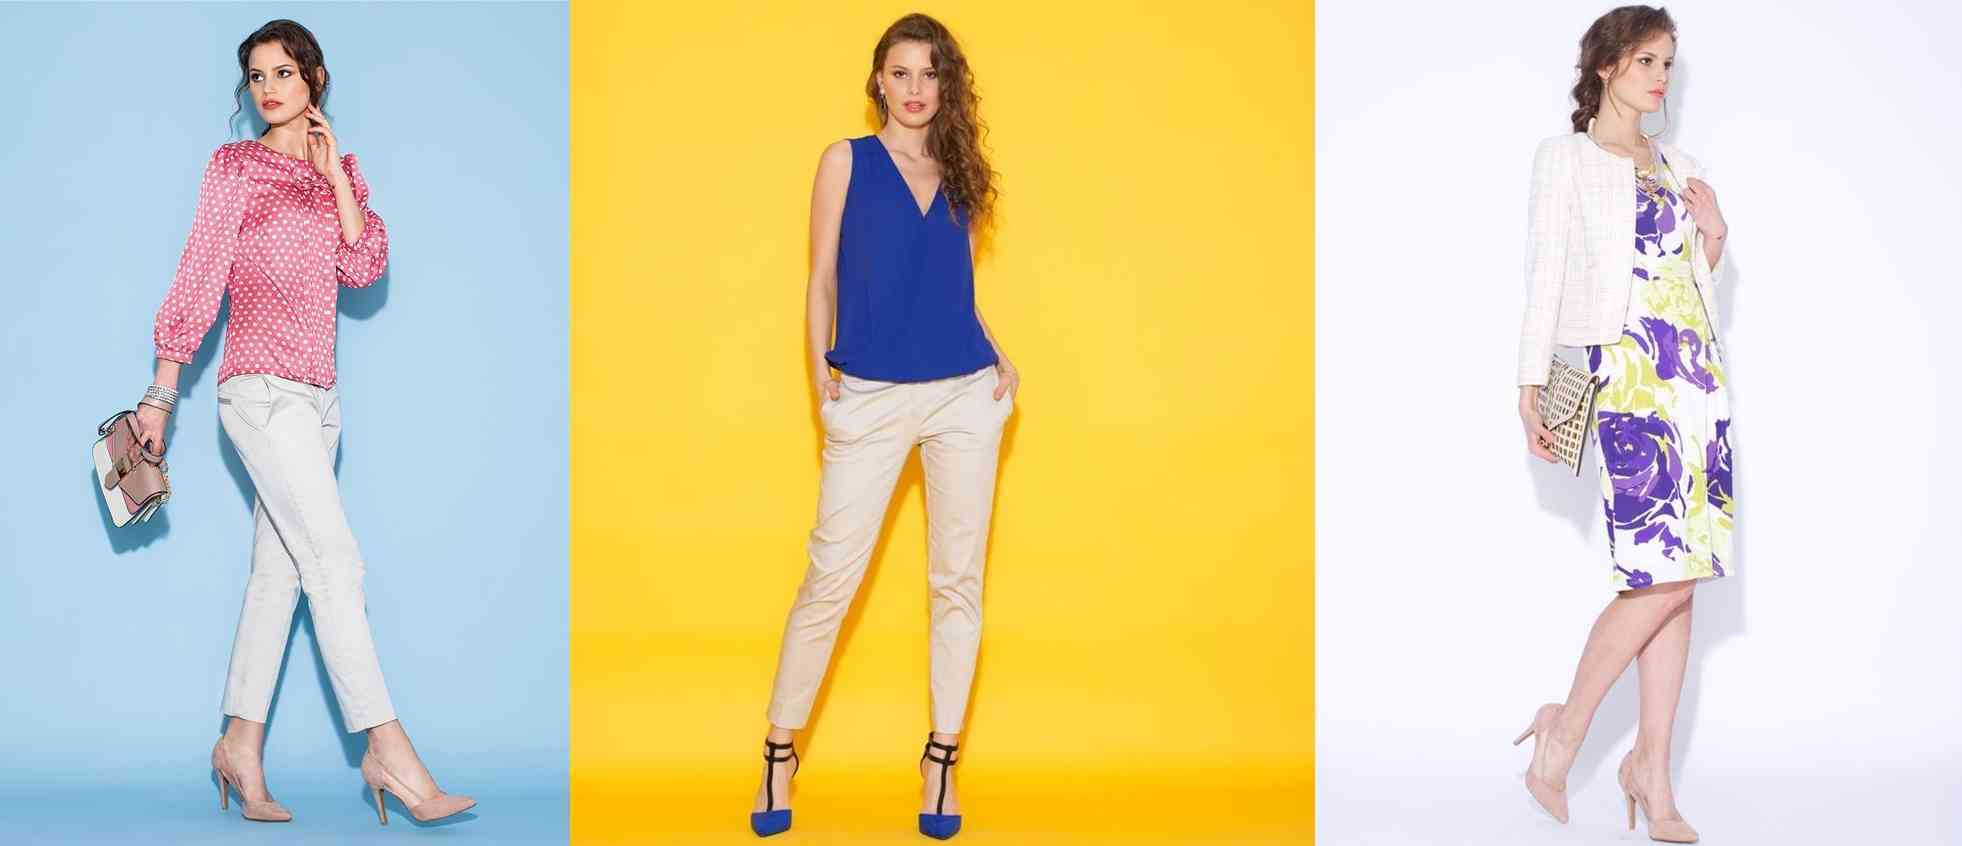 etic ladys fashion